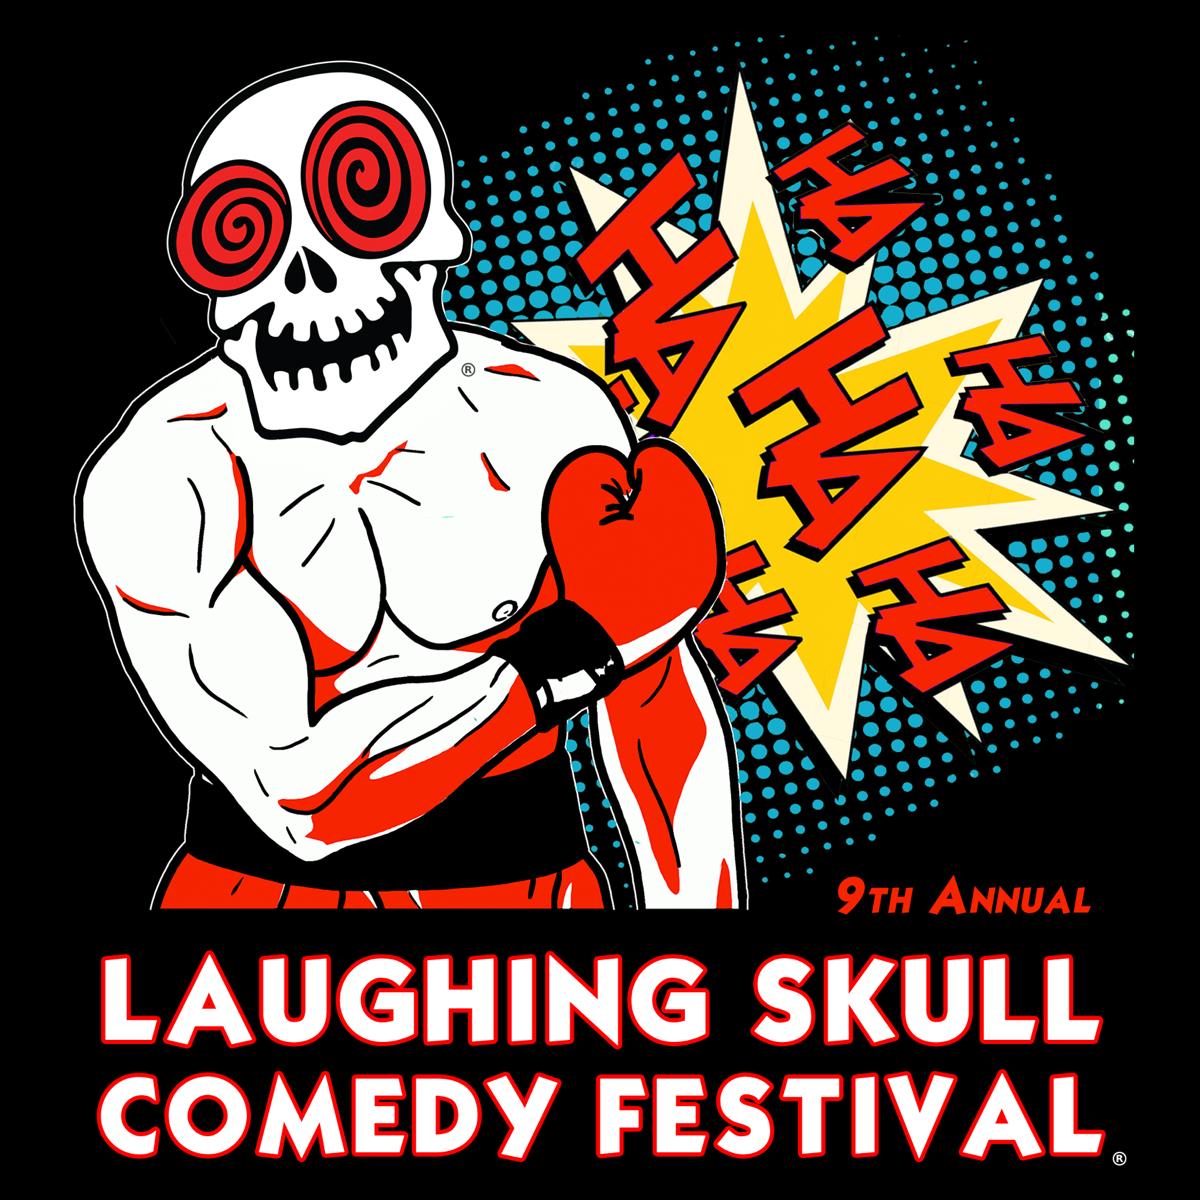 The 9th Annual Laughing Skull Comedy Festival — Friday 8pm Show at Red Light Café — April 27, 2018 — Red Light Café, Atlanta, GA